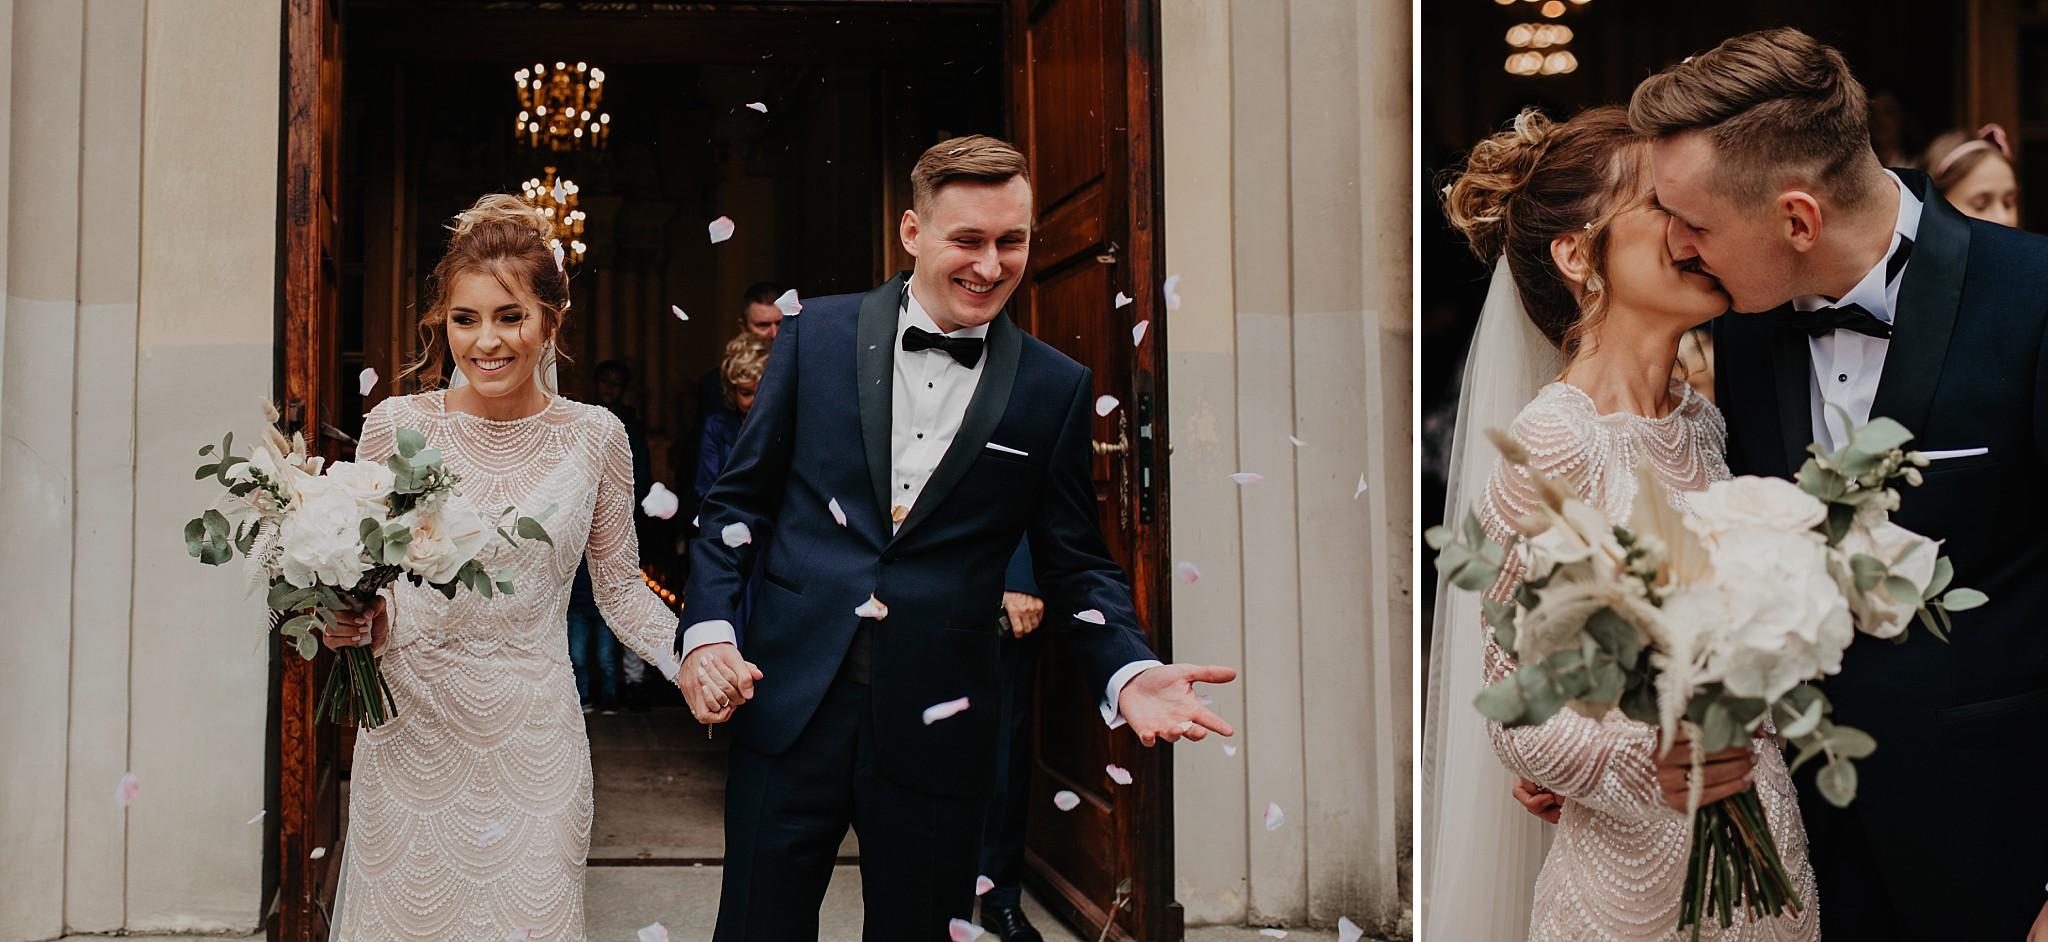 fotograf poznan wesele dobra truskawka piekne wesele pod poznaniem wesele w dobrej truskawce piekna para mloda slub marzen slub koronawirus slub listopad wesele koronawirus 222